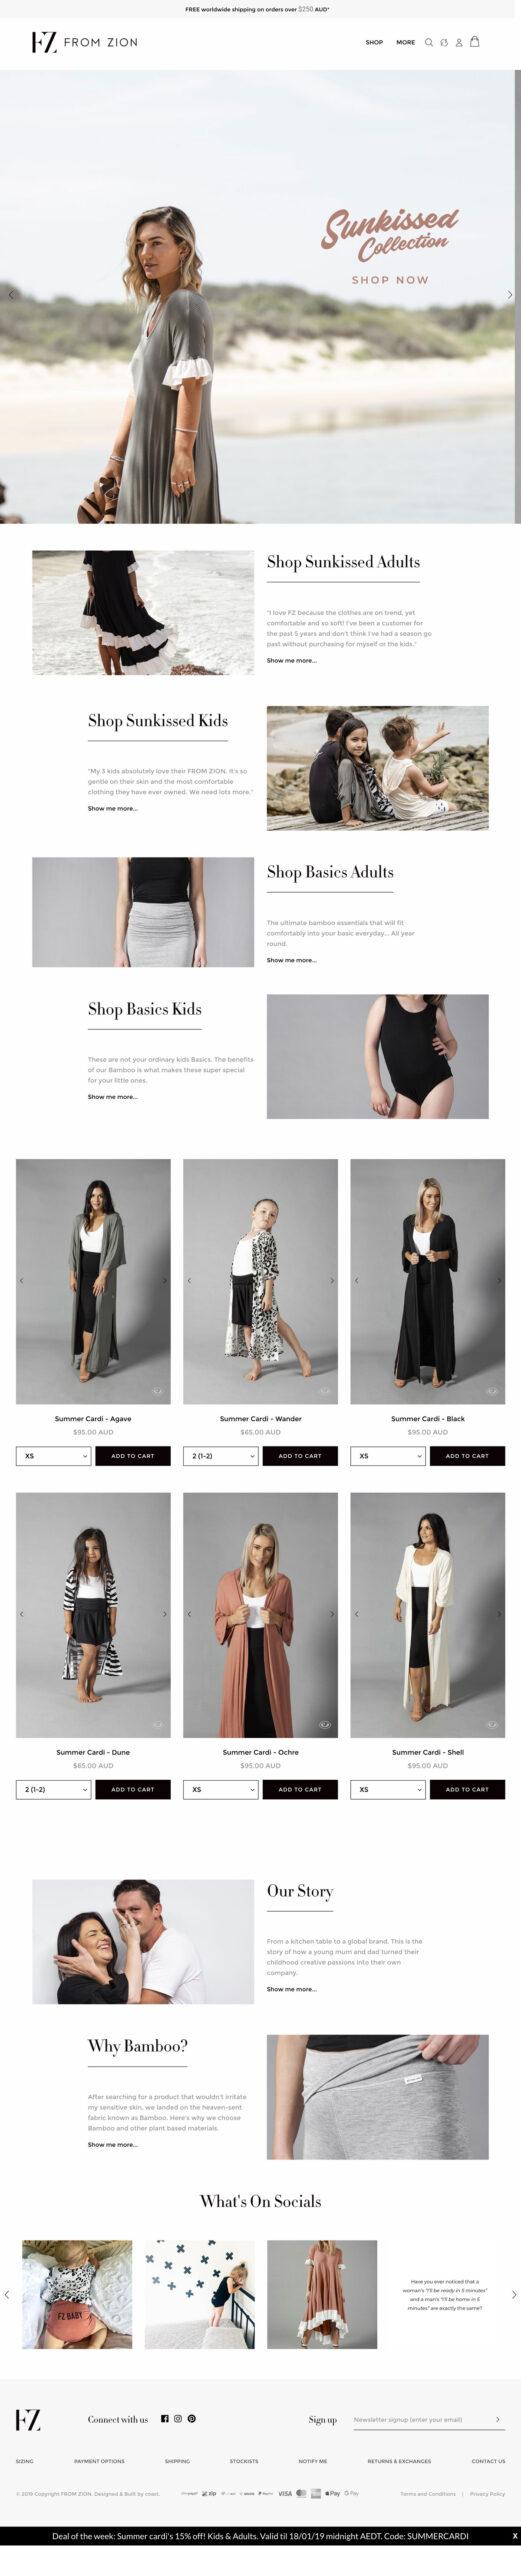 Website Design & Development for From Zion